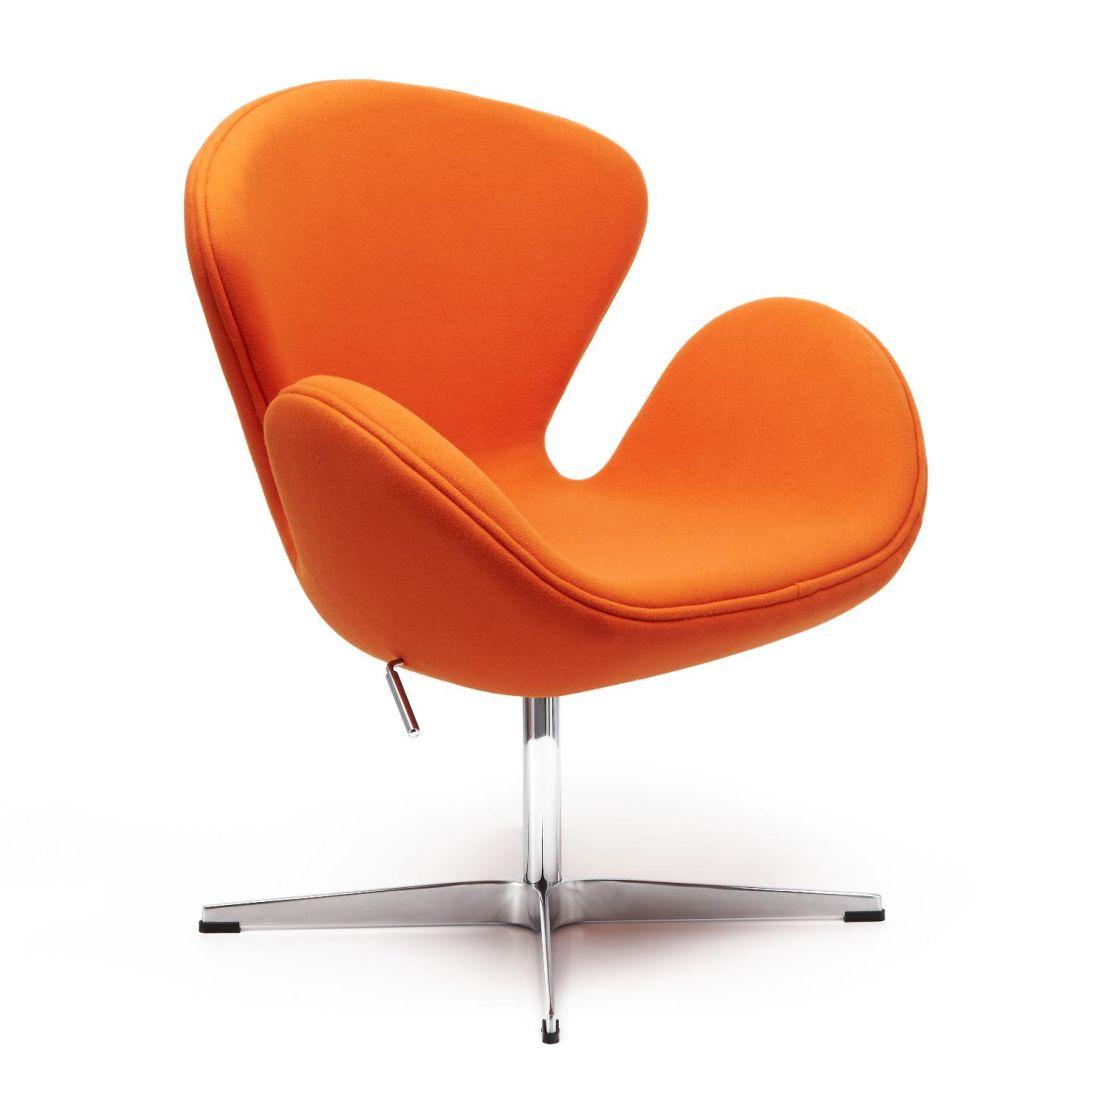 Кресло SWAN CHAIR оранжевый, кашемир